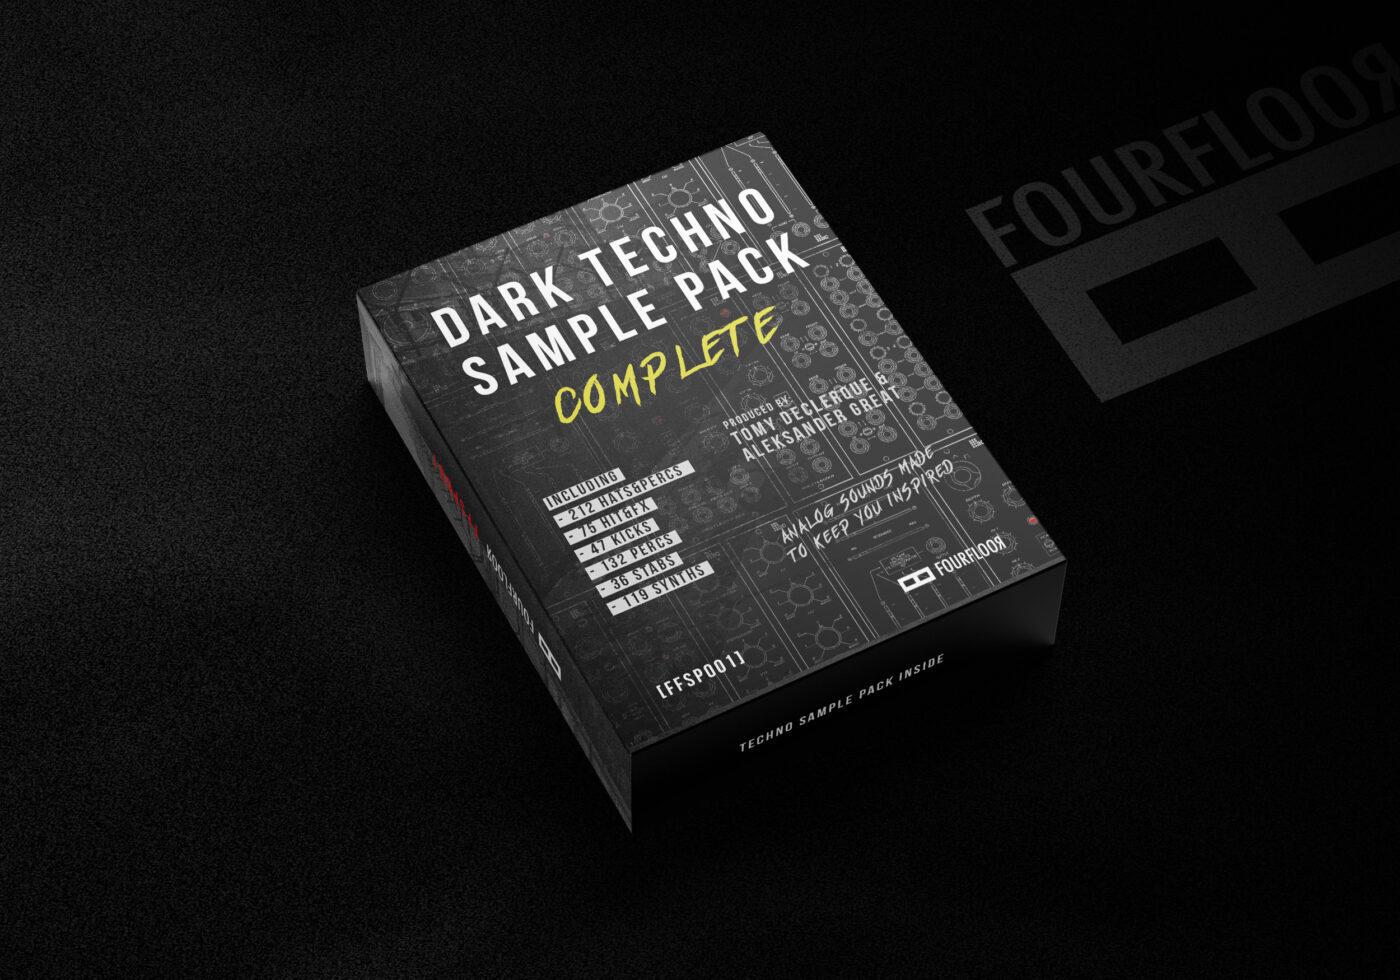 Dark Techno Sample Pack - Complete - Box